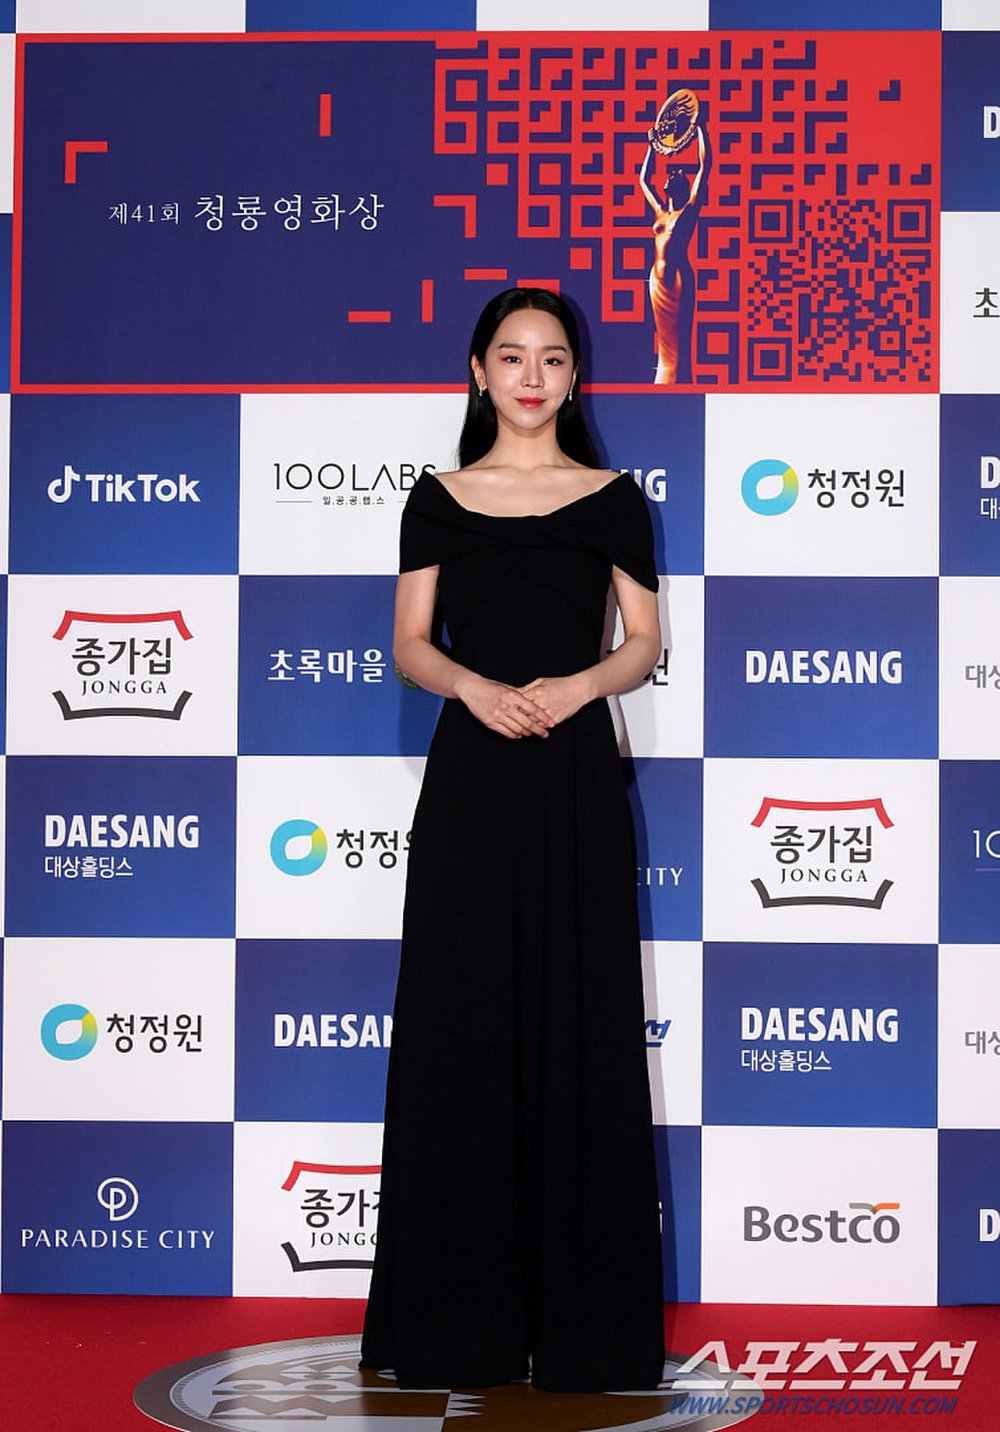 Thảm đỏ 'Rồng xanh 2020': Shin Hye Sun 'cân sắc' Shin Min Ah, Jung Woo Sung - Lee Byung Hun điển trai! Ảnh 14